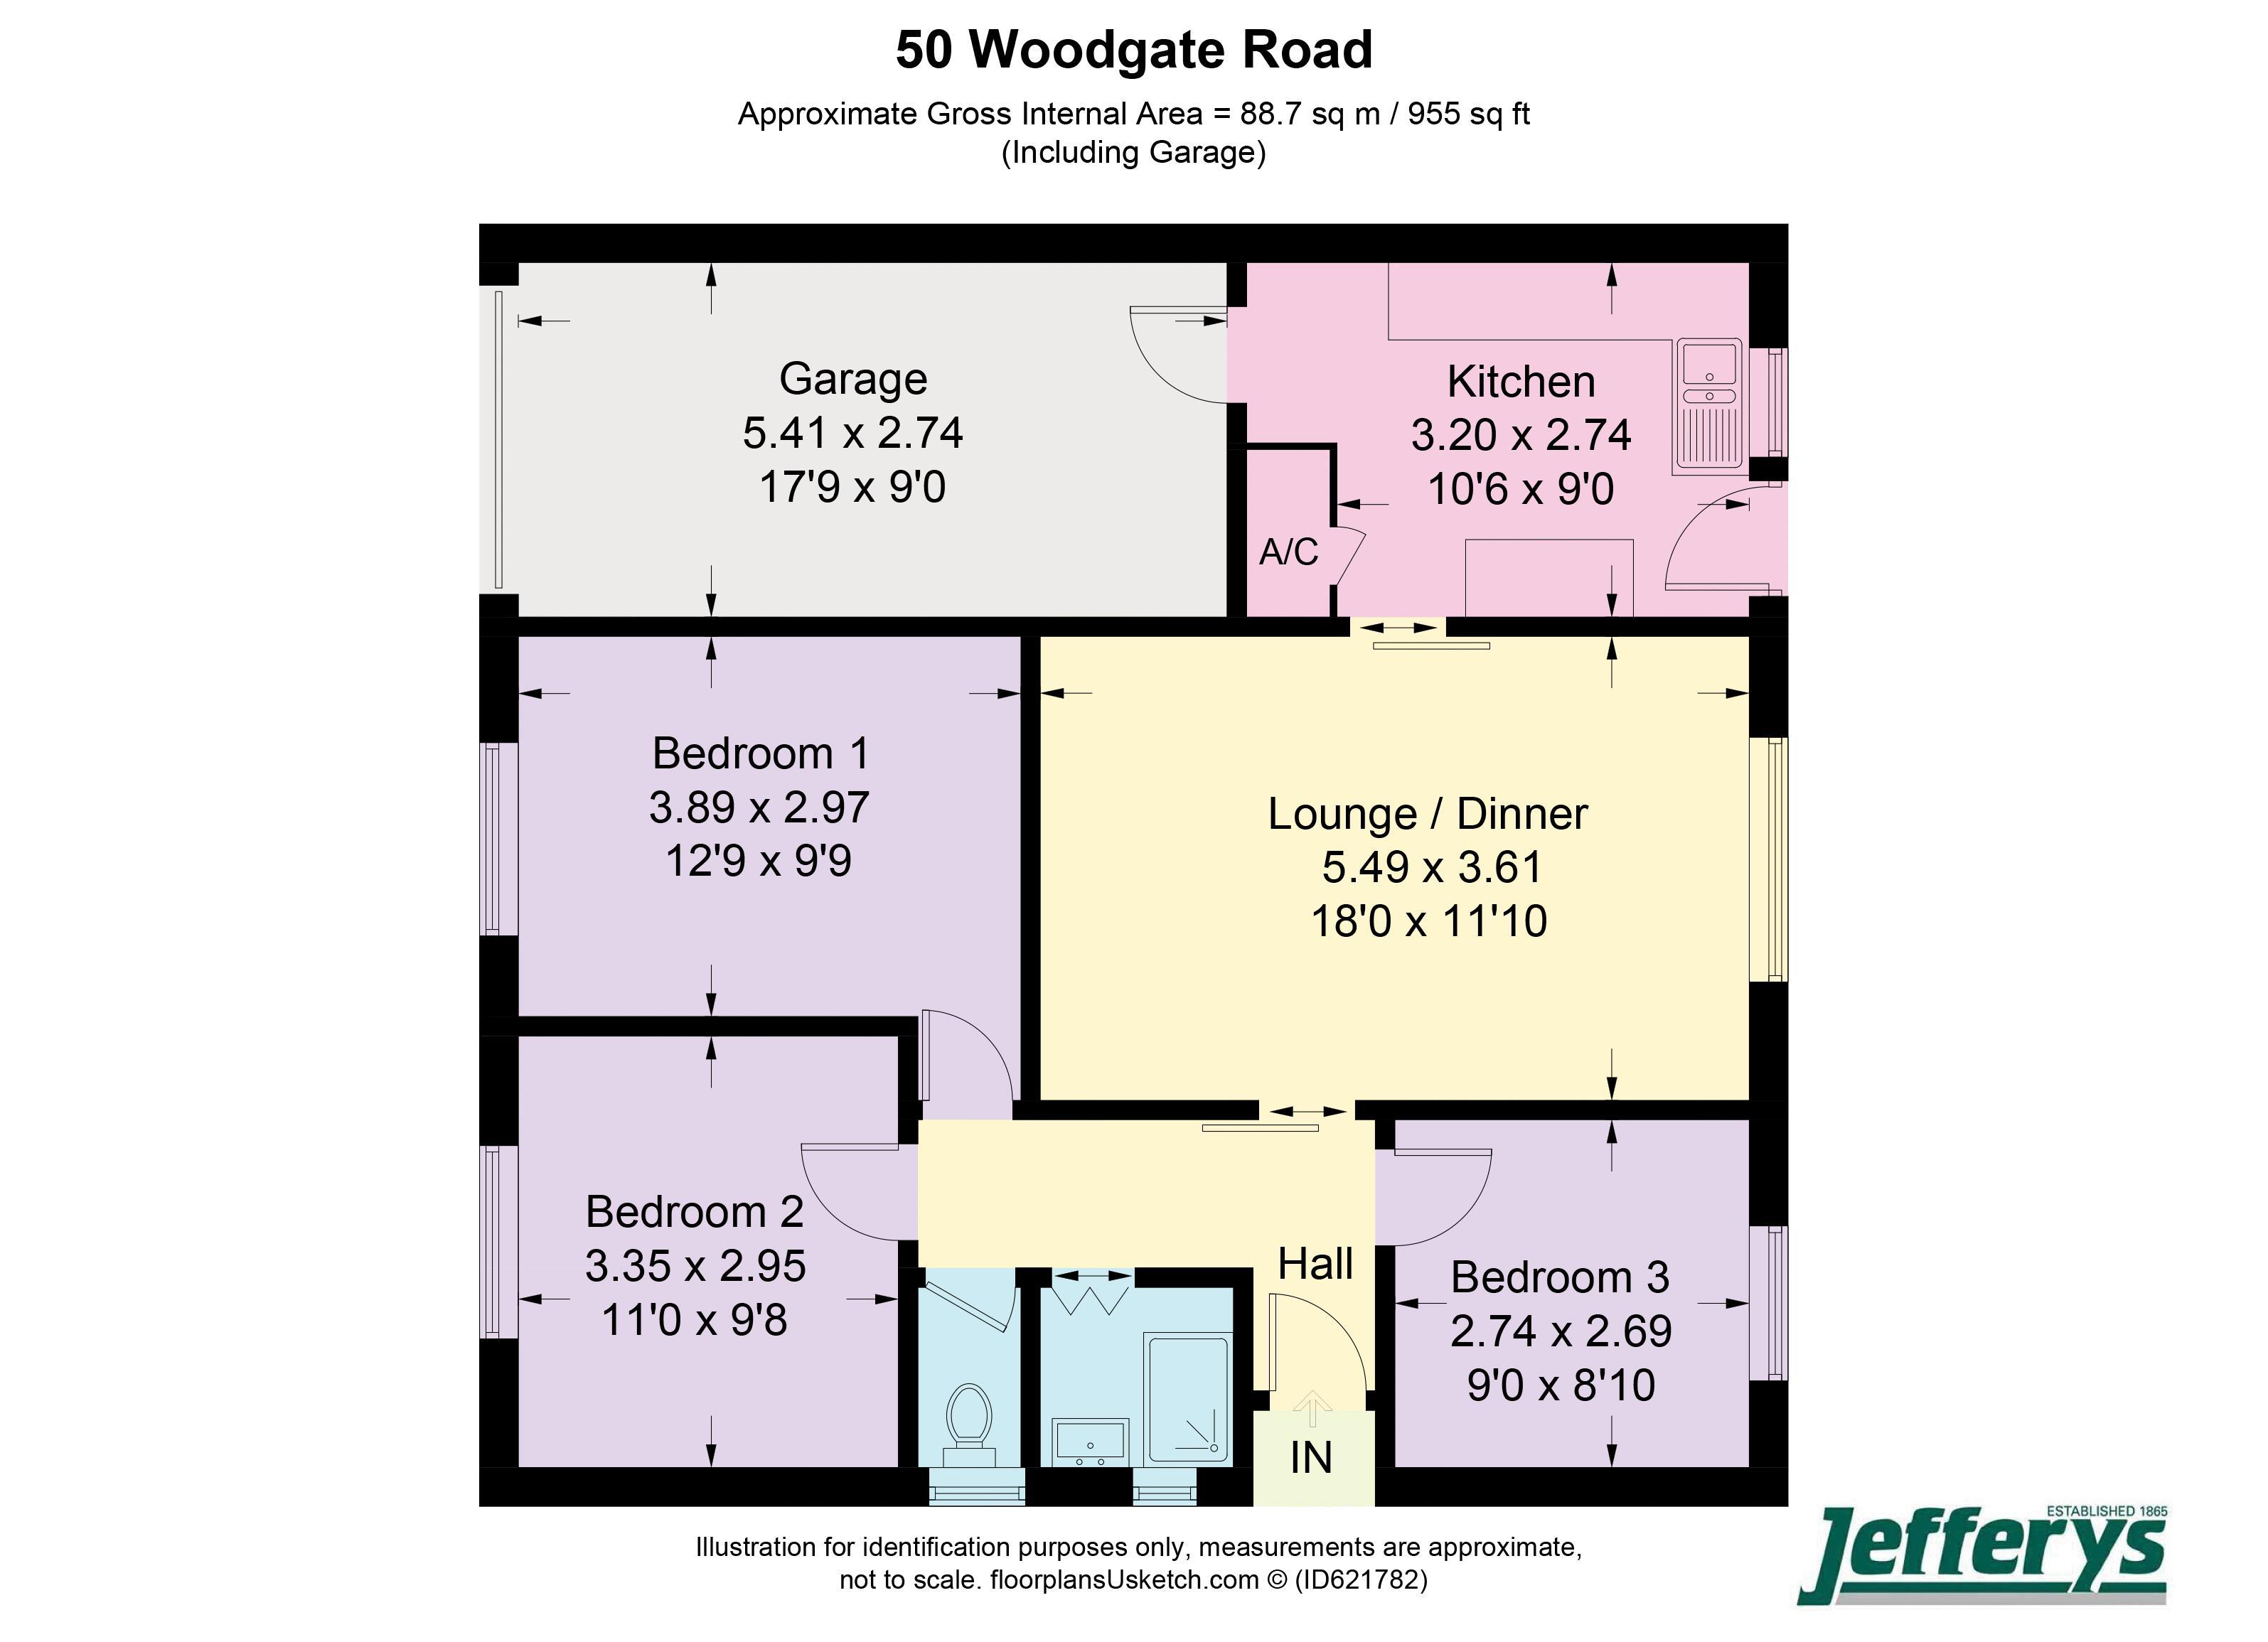 Woodgate Road